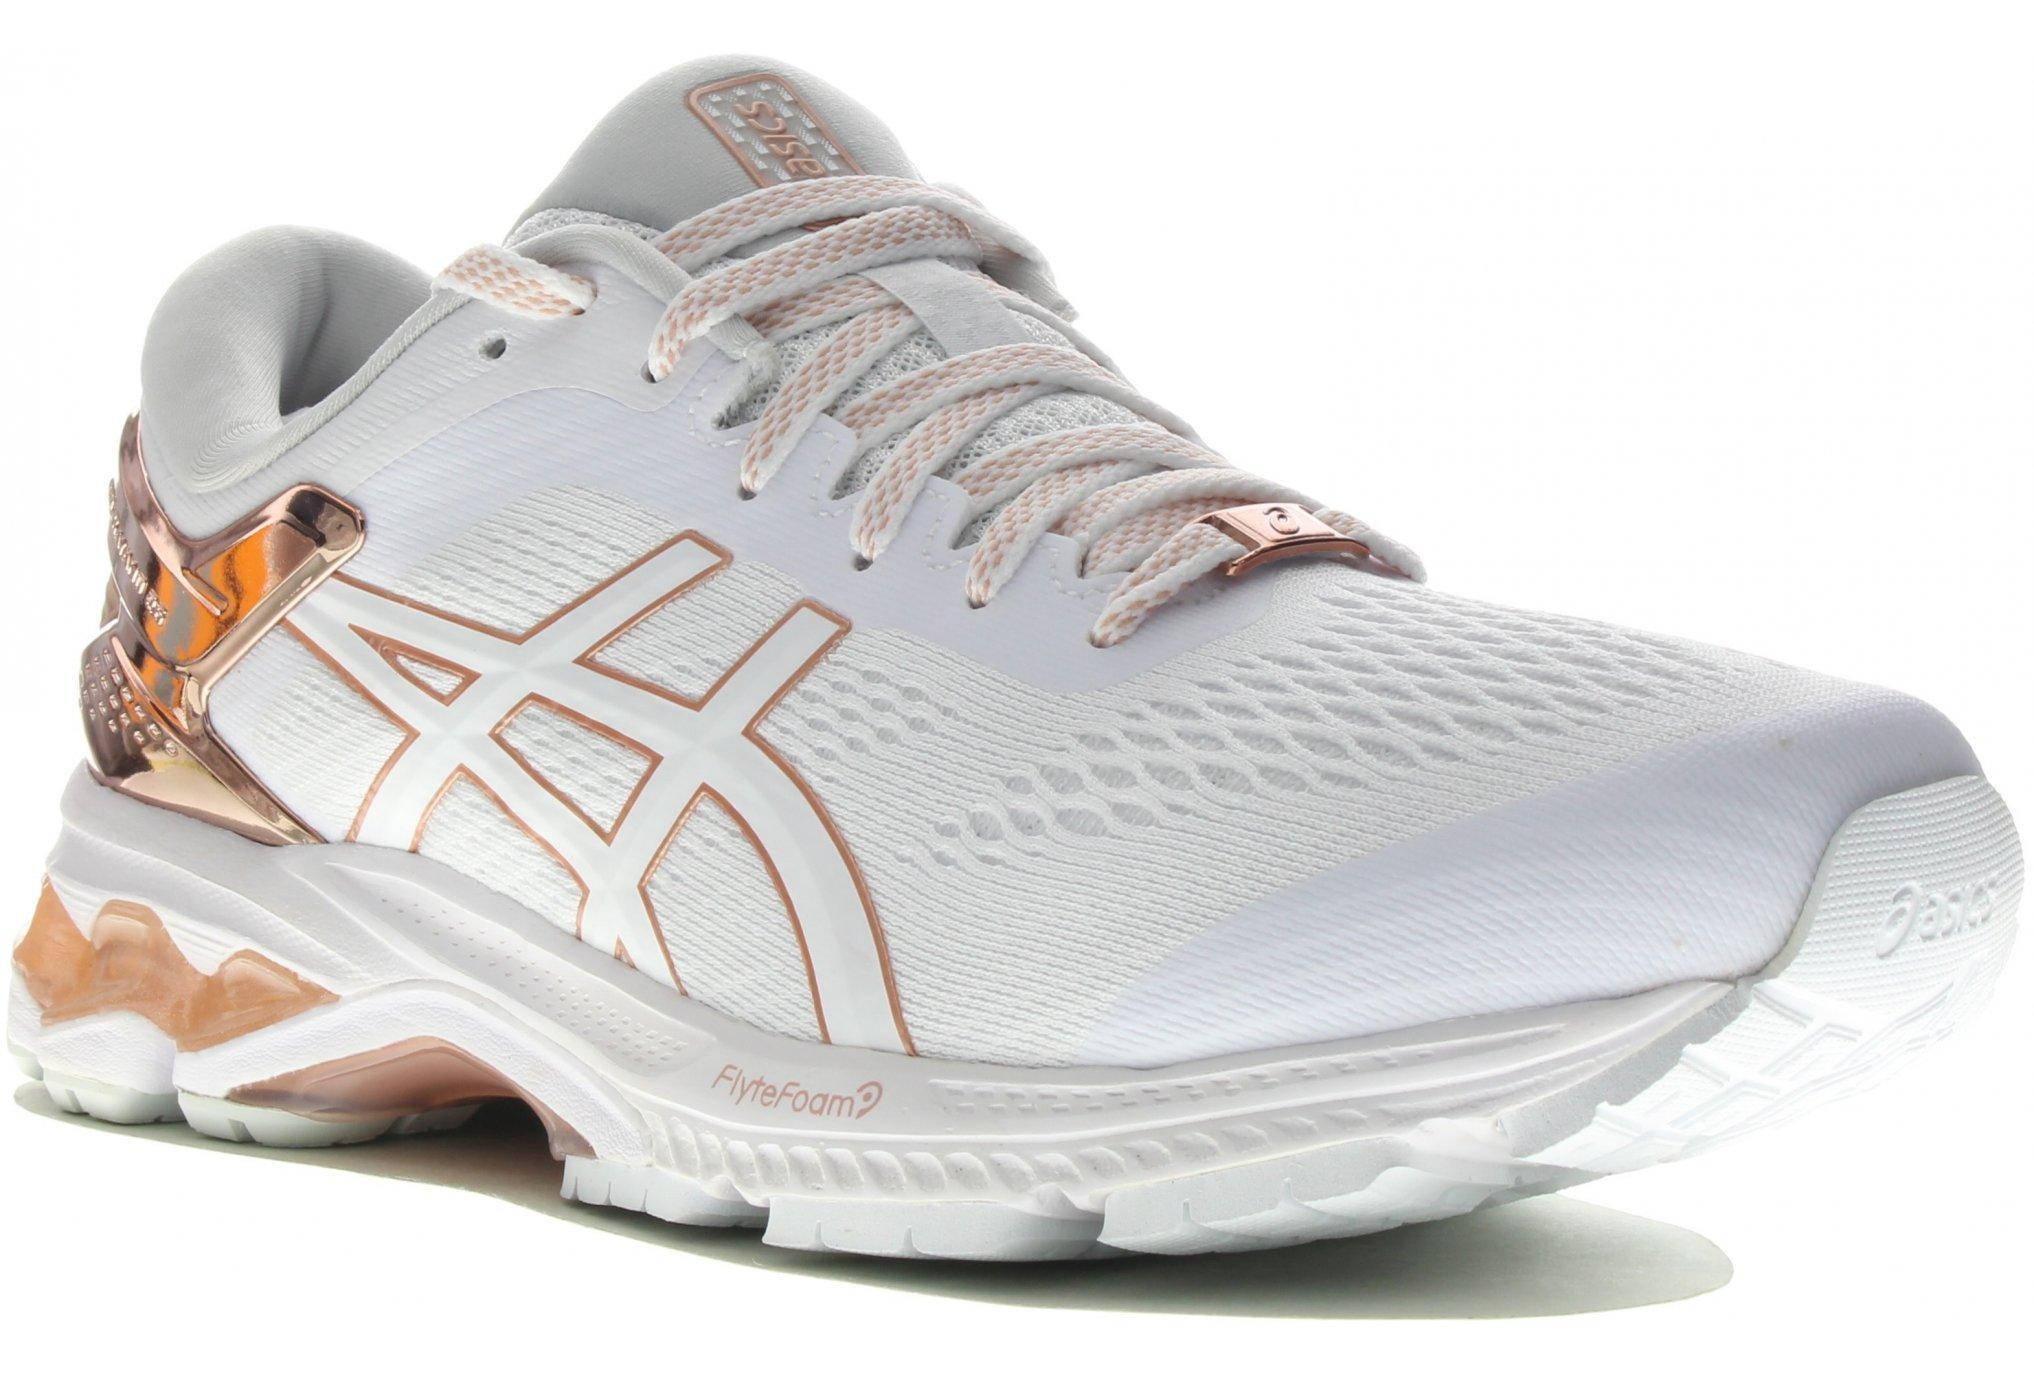 Asics Gel Kayano 26 Platinum Chaussures running femme